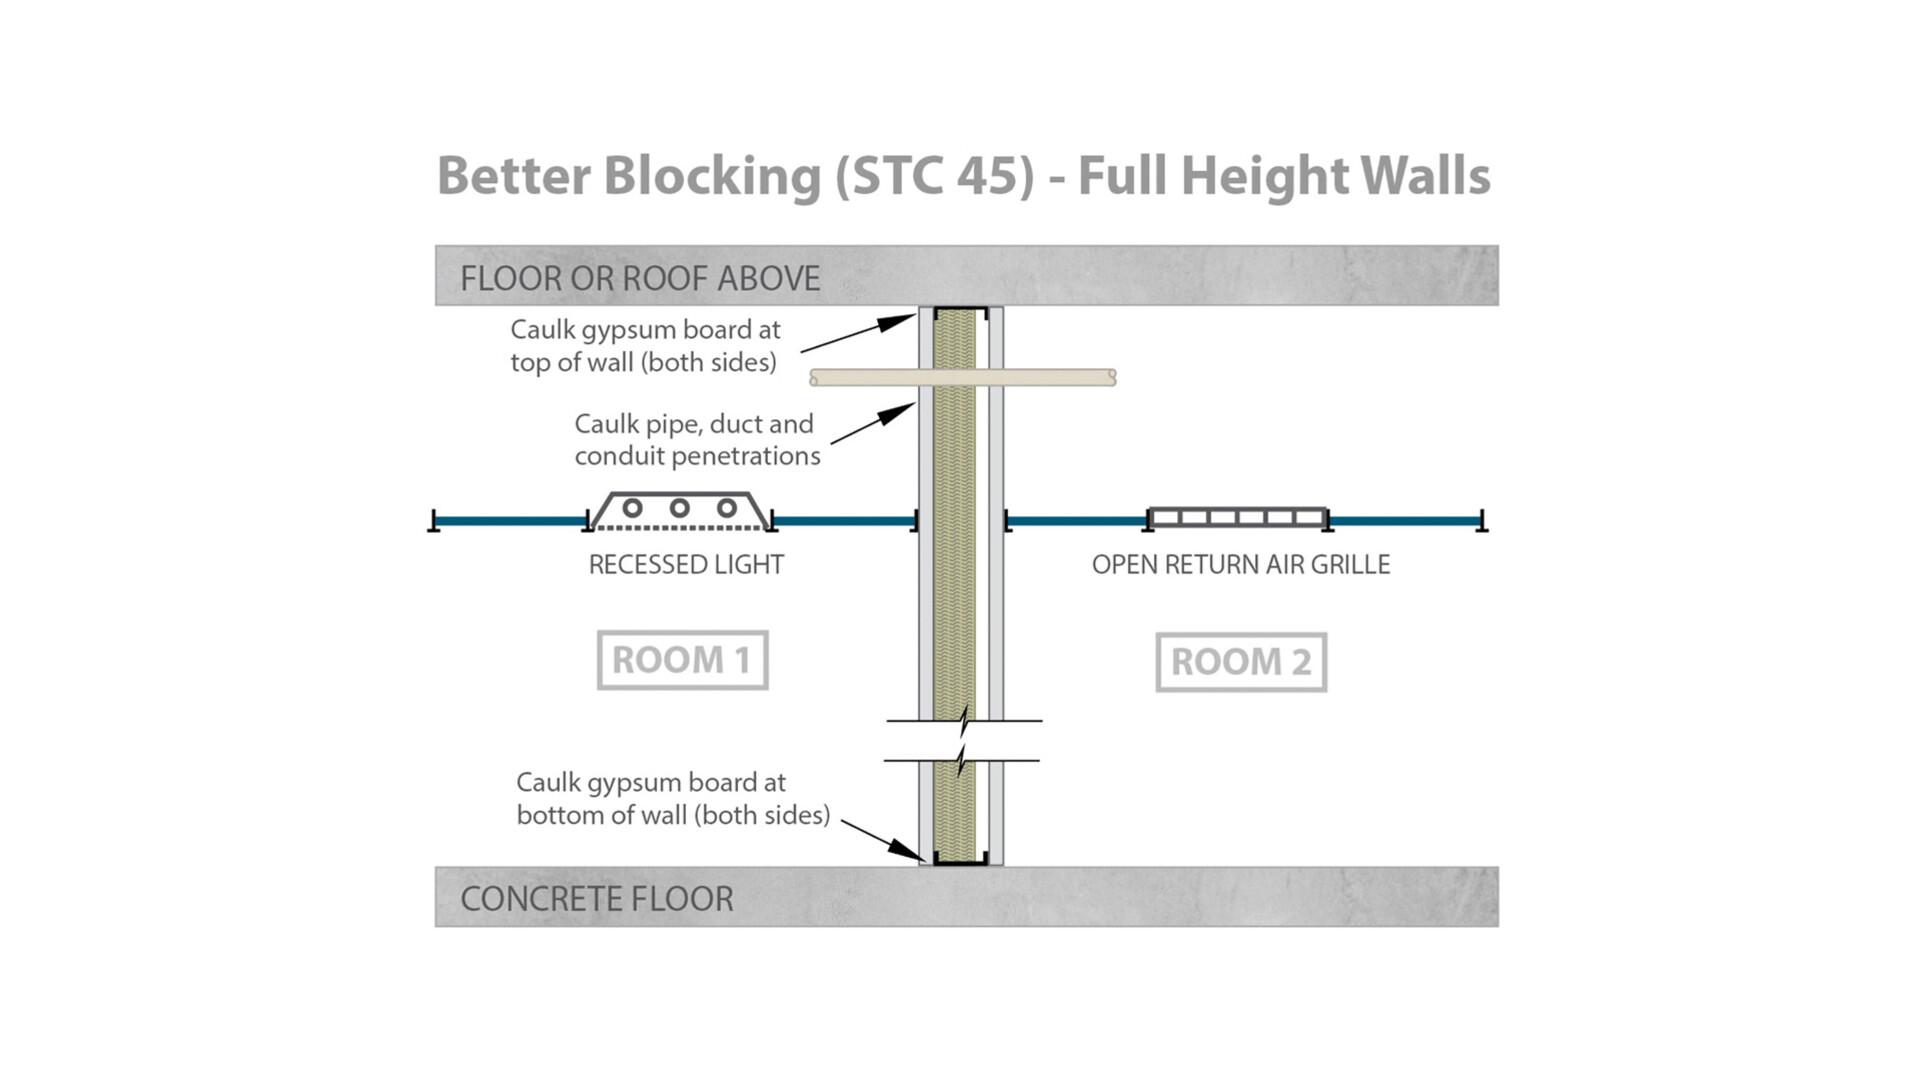 RFN-NA, optimized acoustics, better sound blocking, STC 45 full height walls